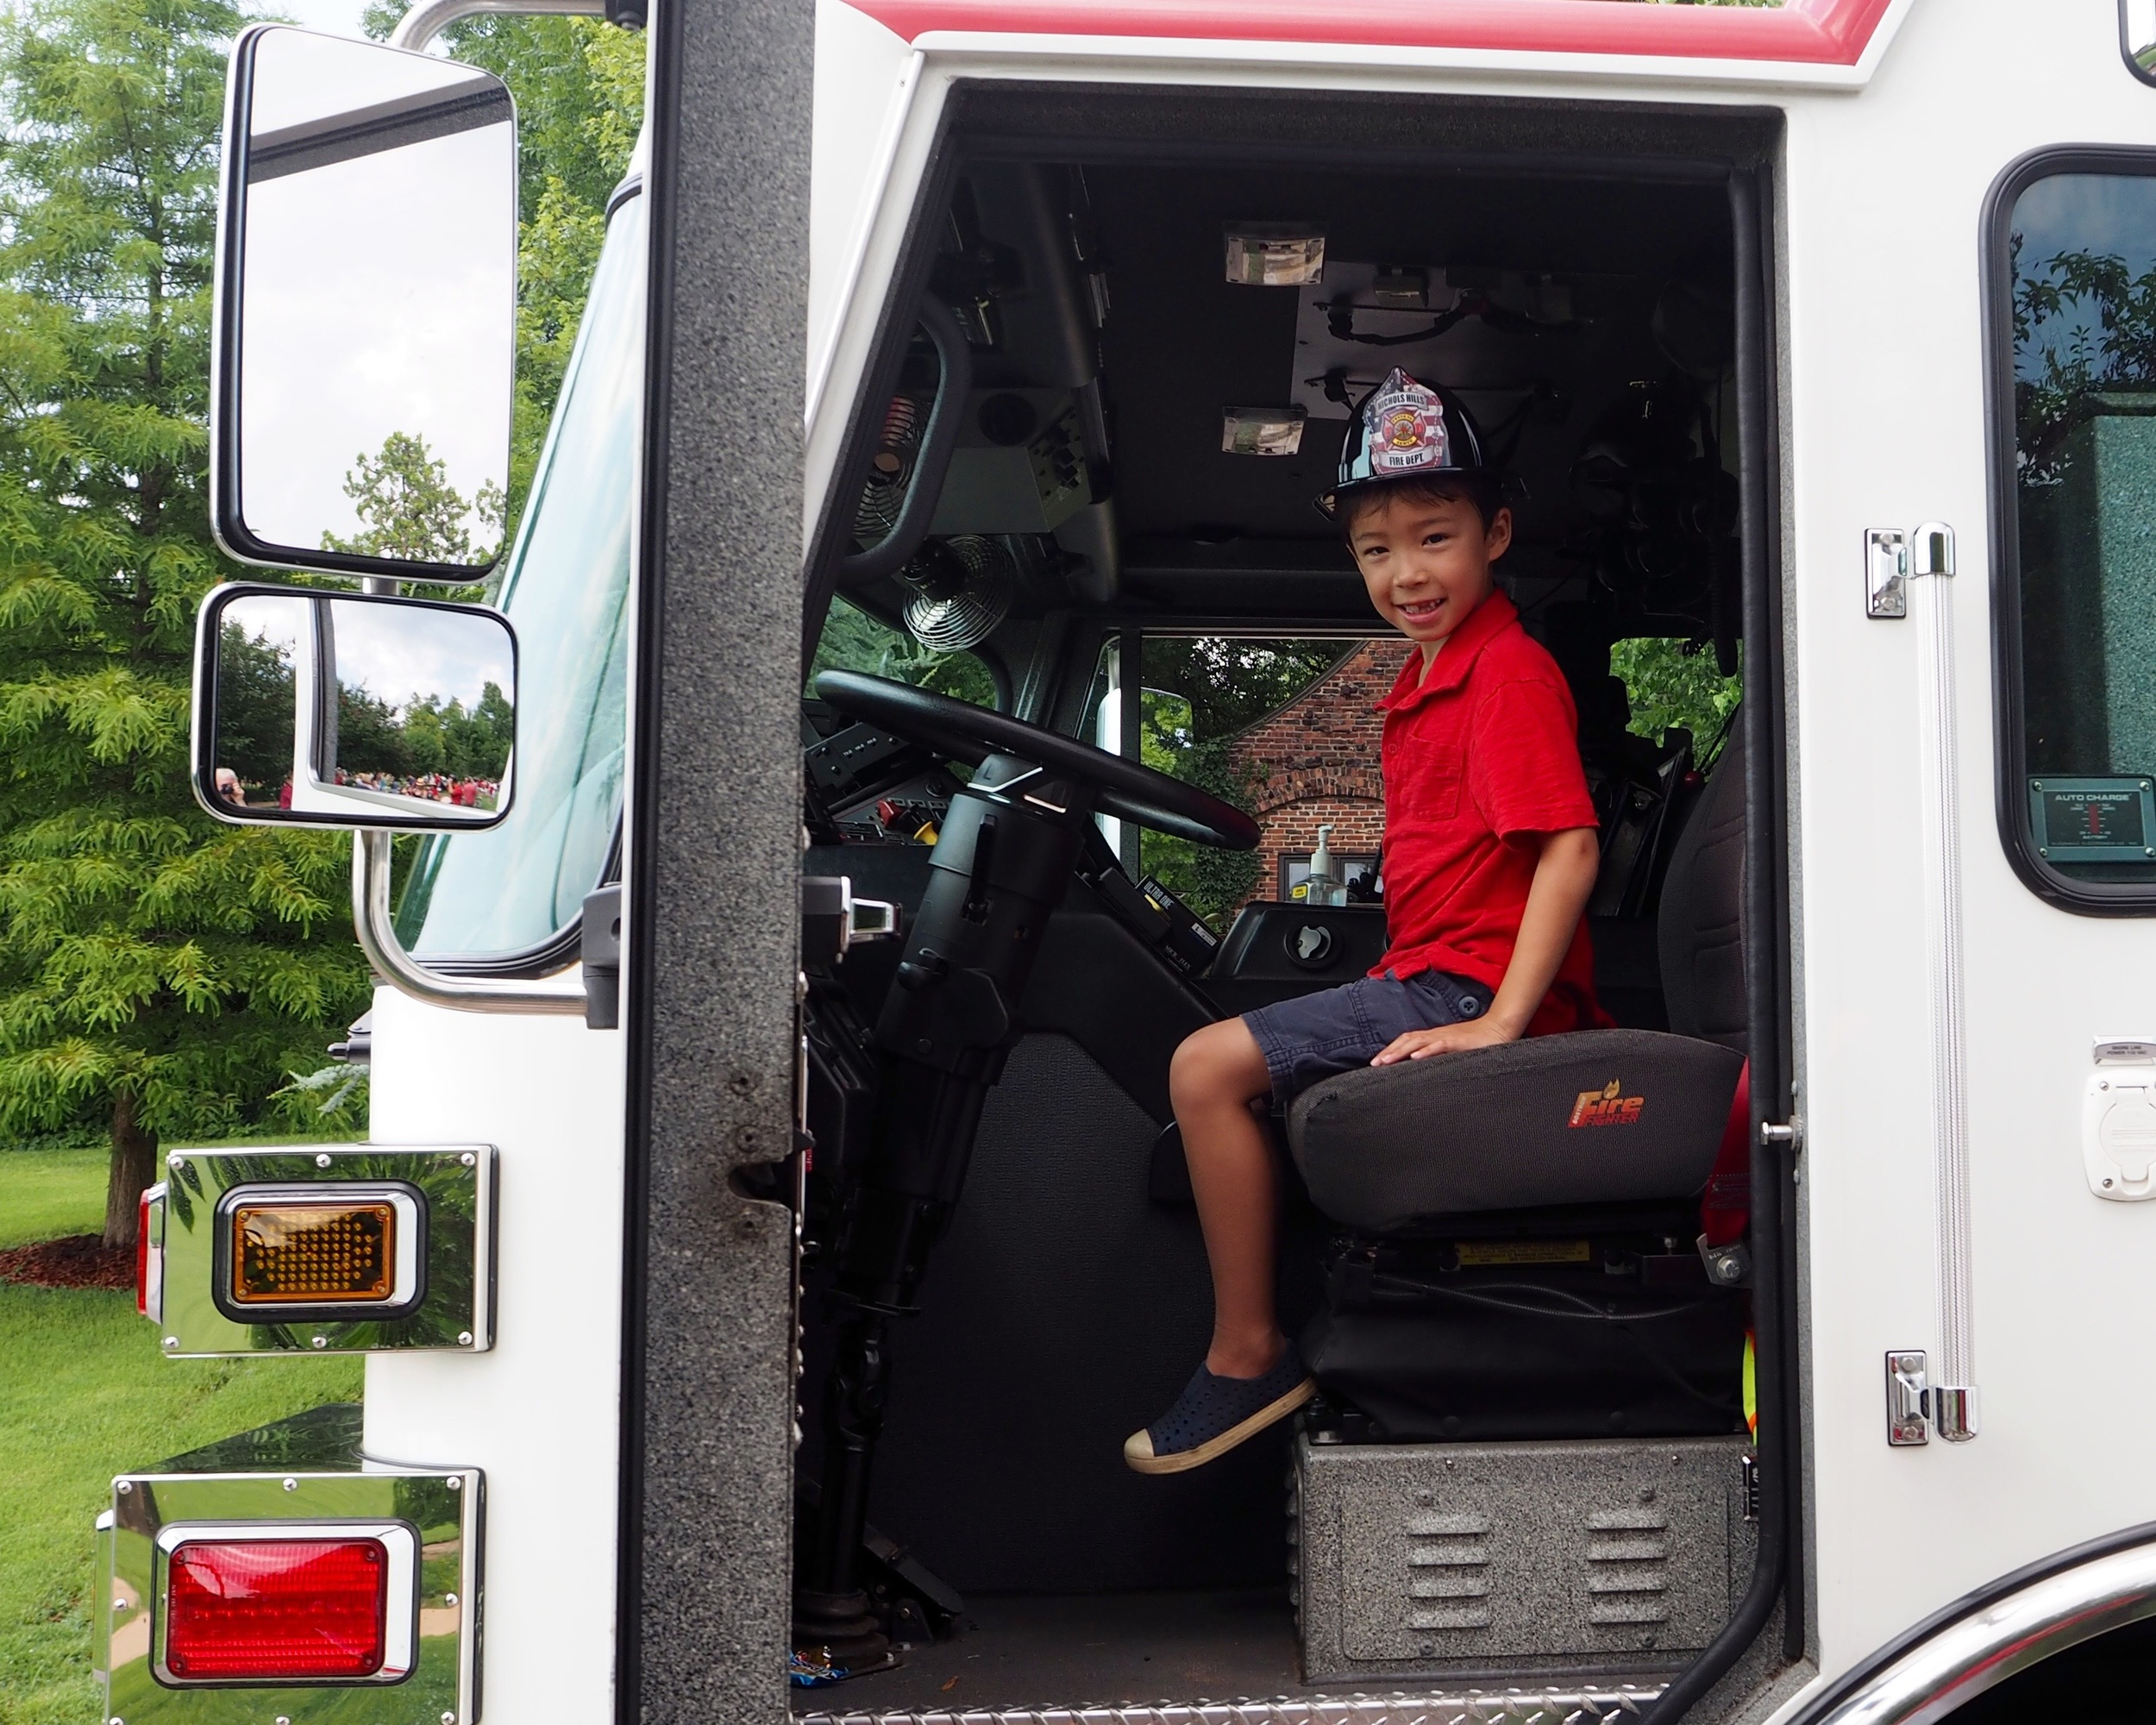 Future fireman?